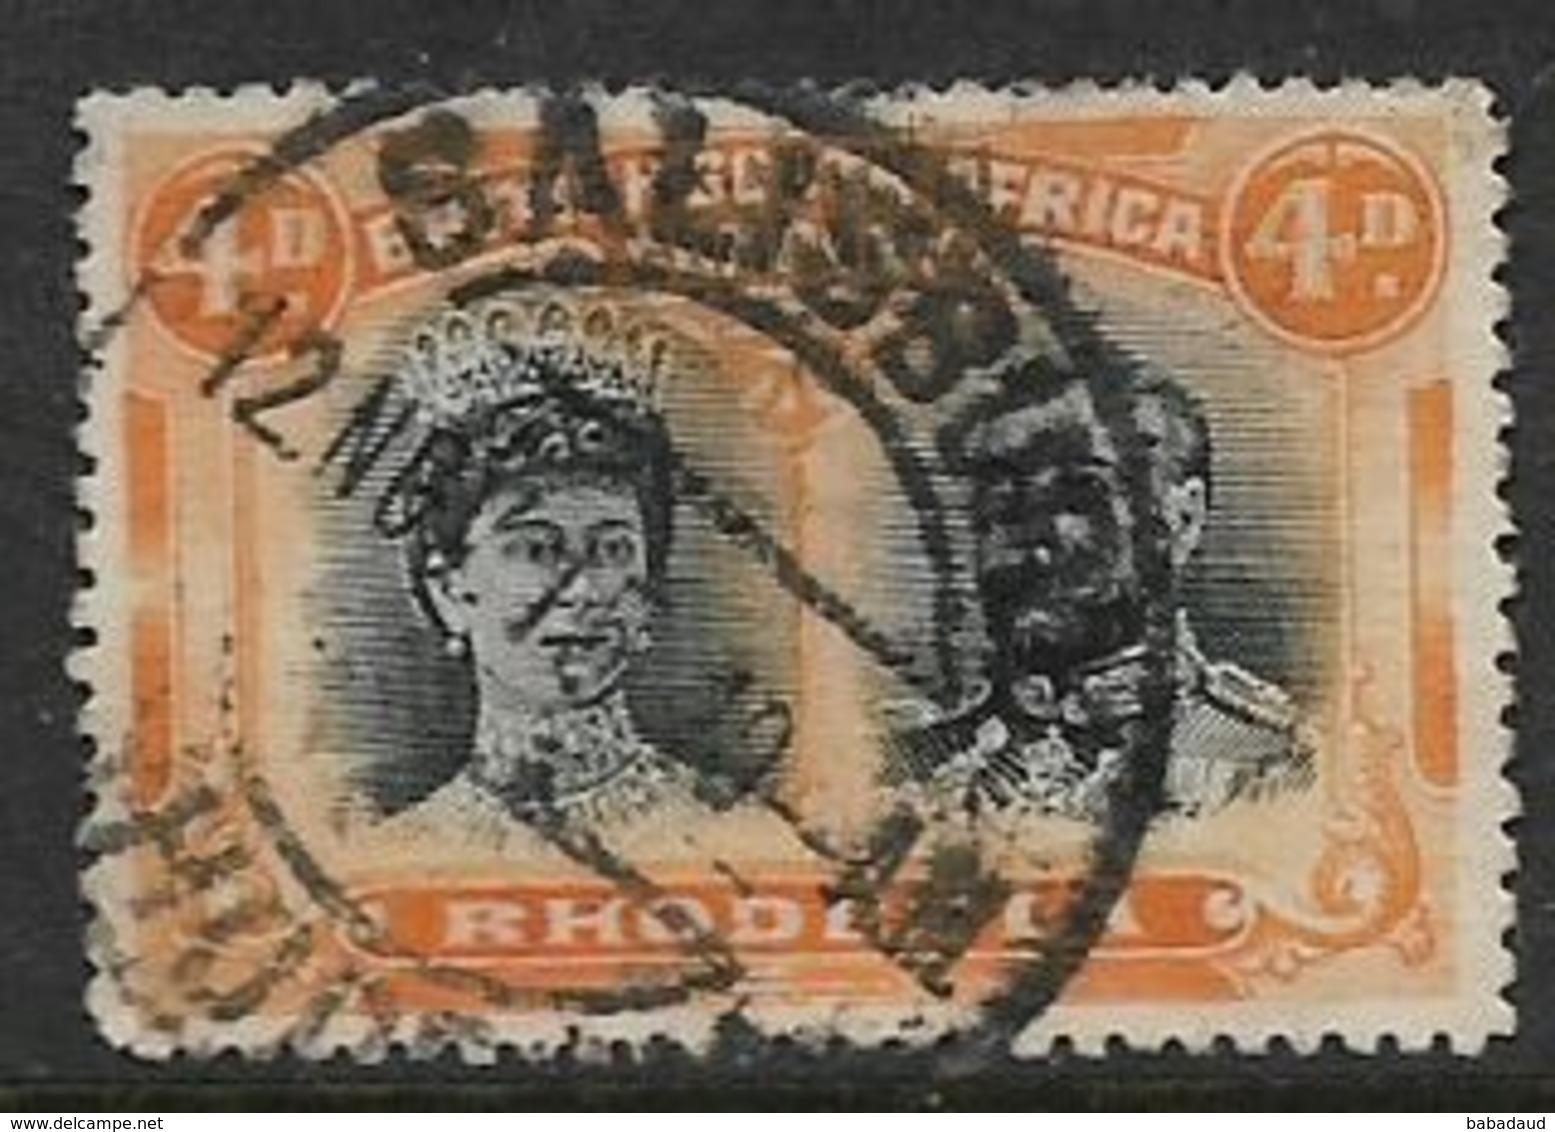 Southern Rhodesia / B.S.A.Co.1910, Doiuble Head,, 4d, Purple & Orange,  Perf 14, Used - Southern Rhodesia (...-1964)